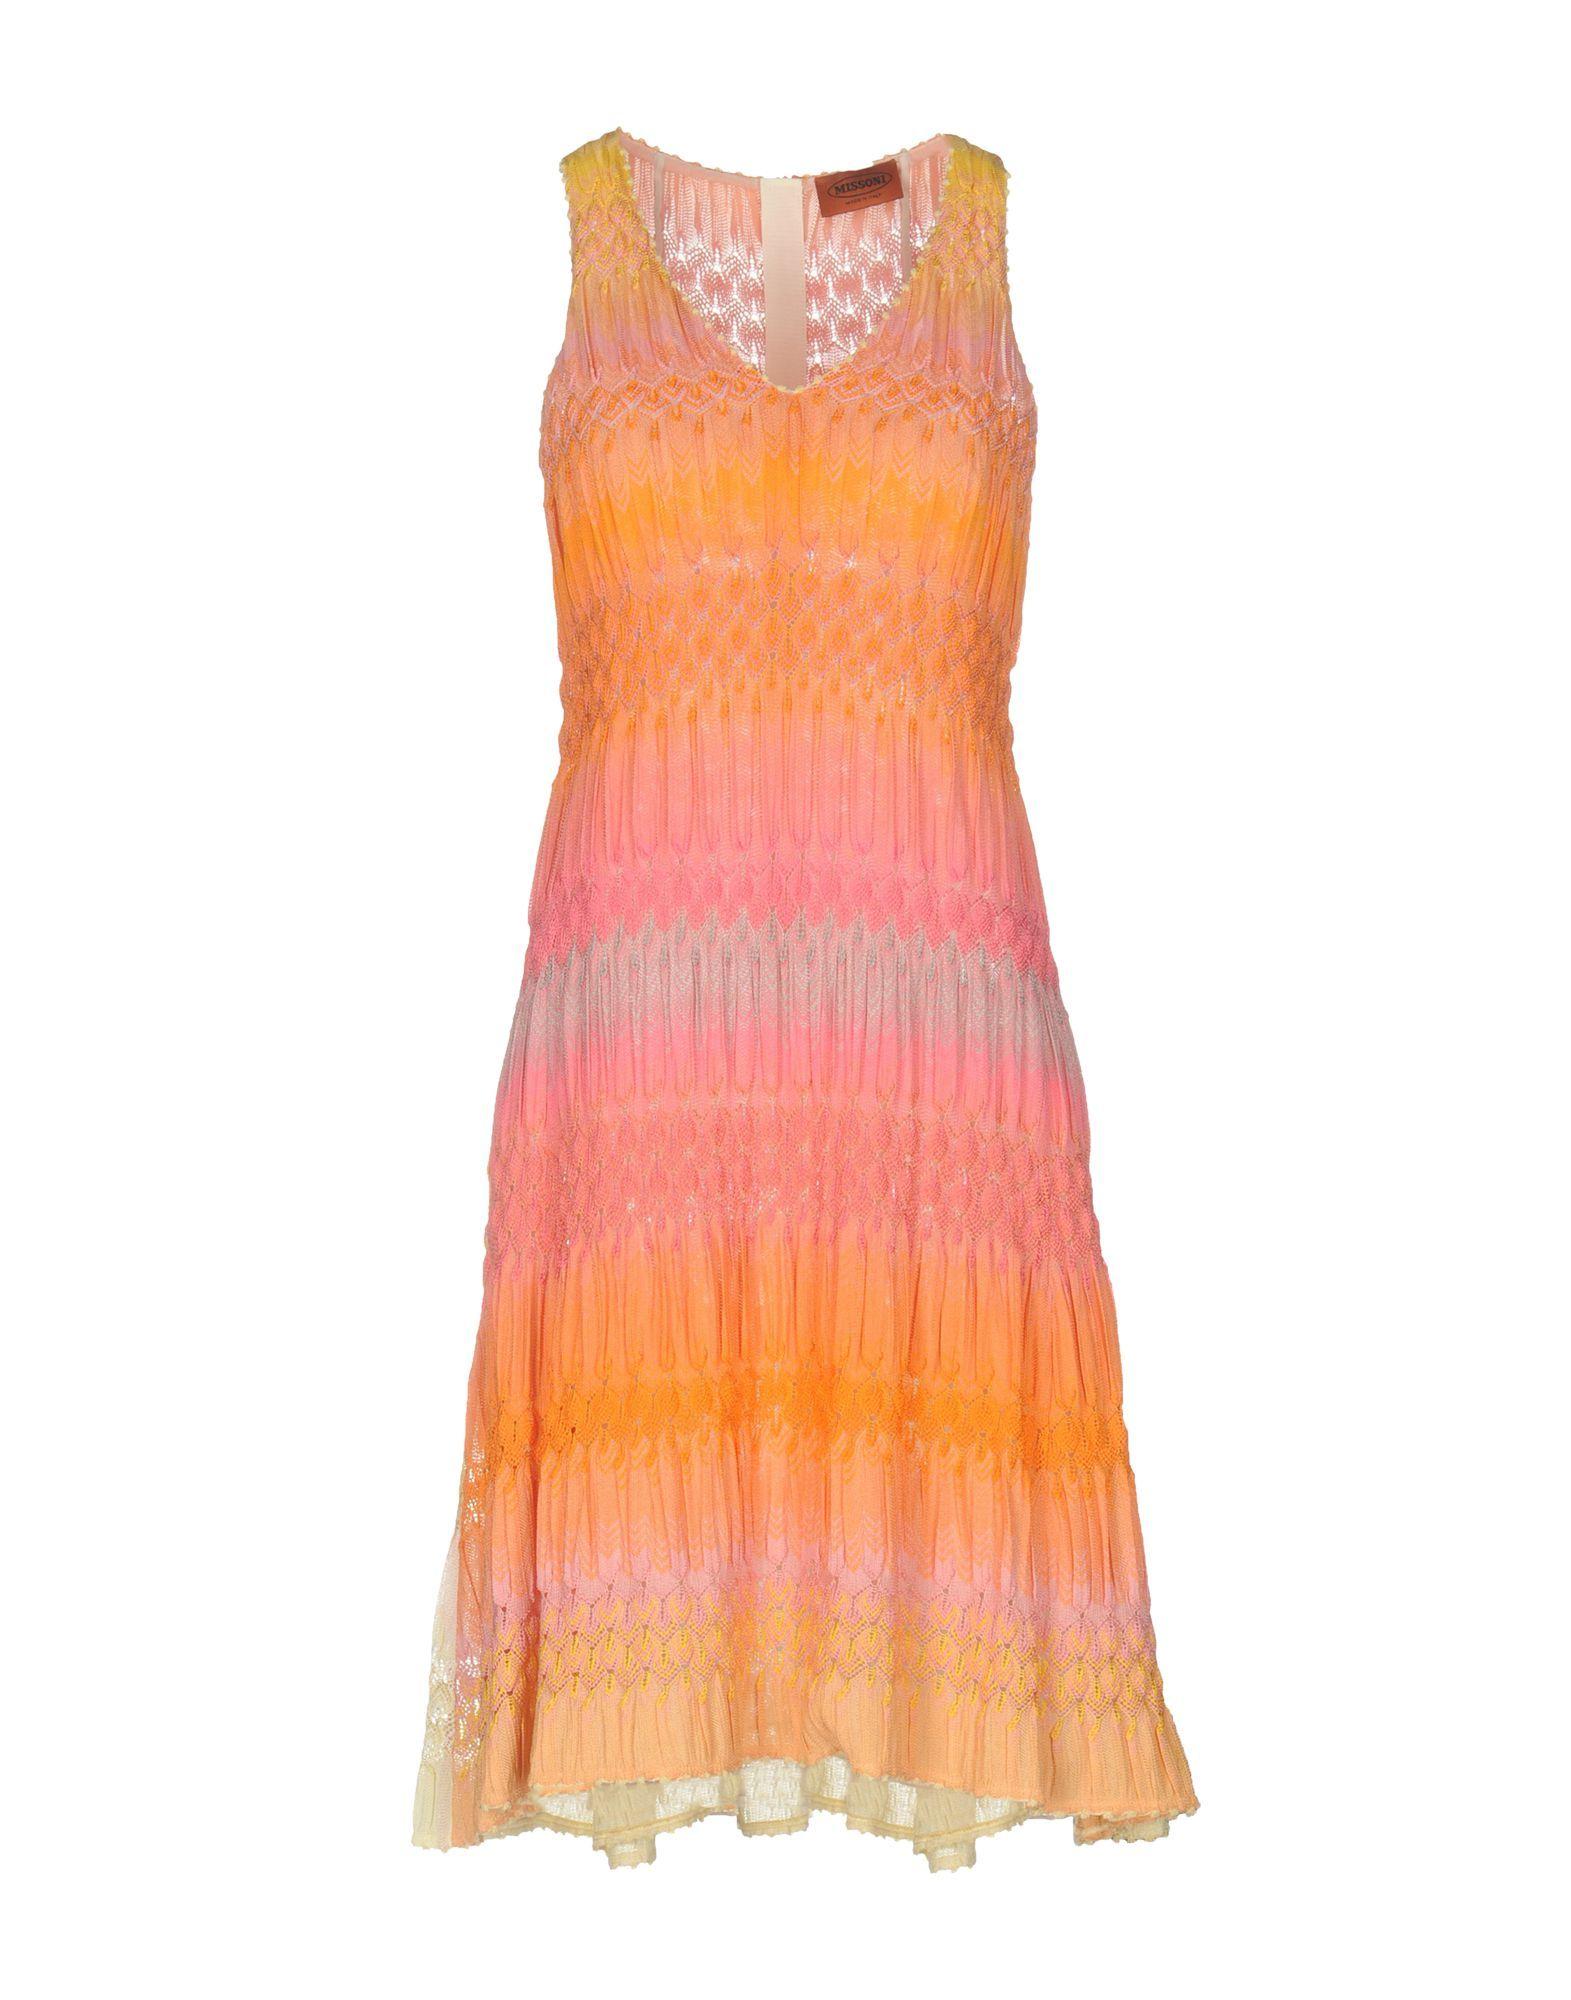 Missoni Orange Knit Sleeveless Dress